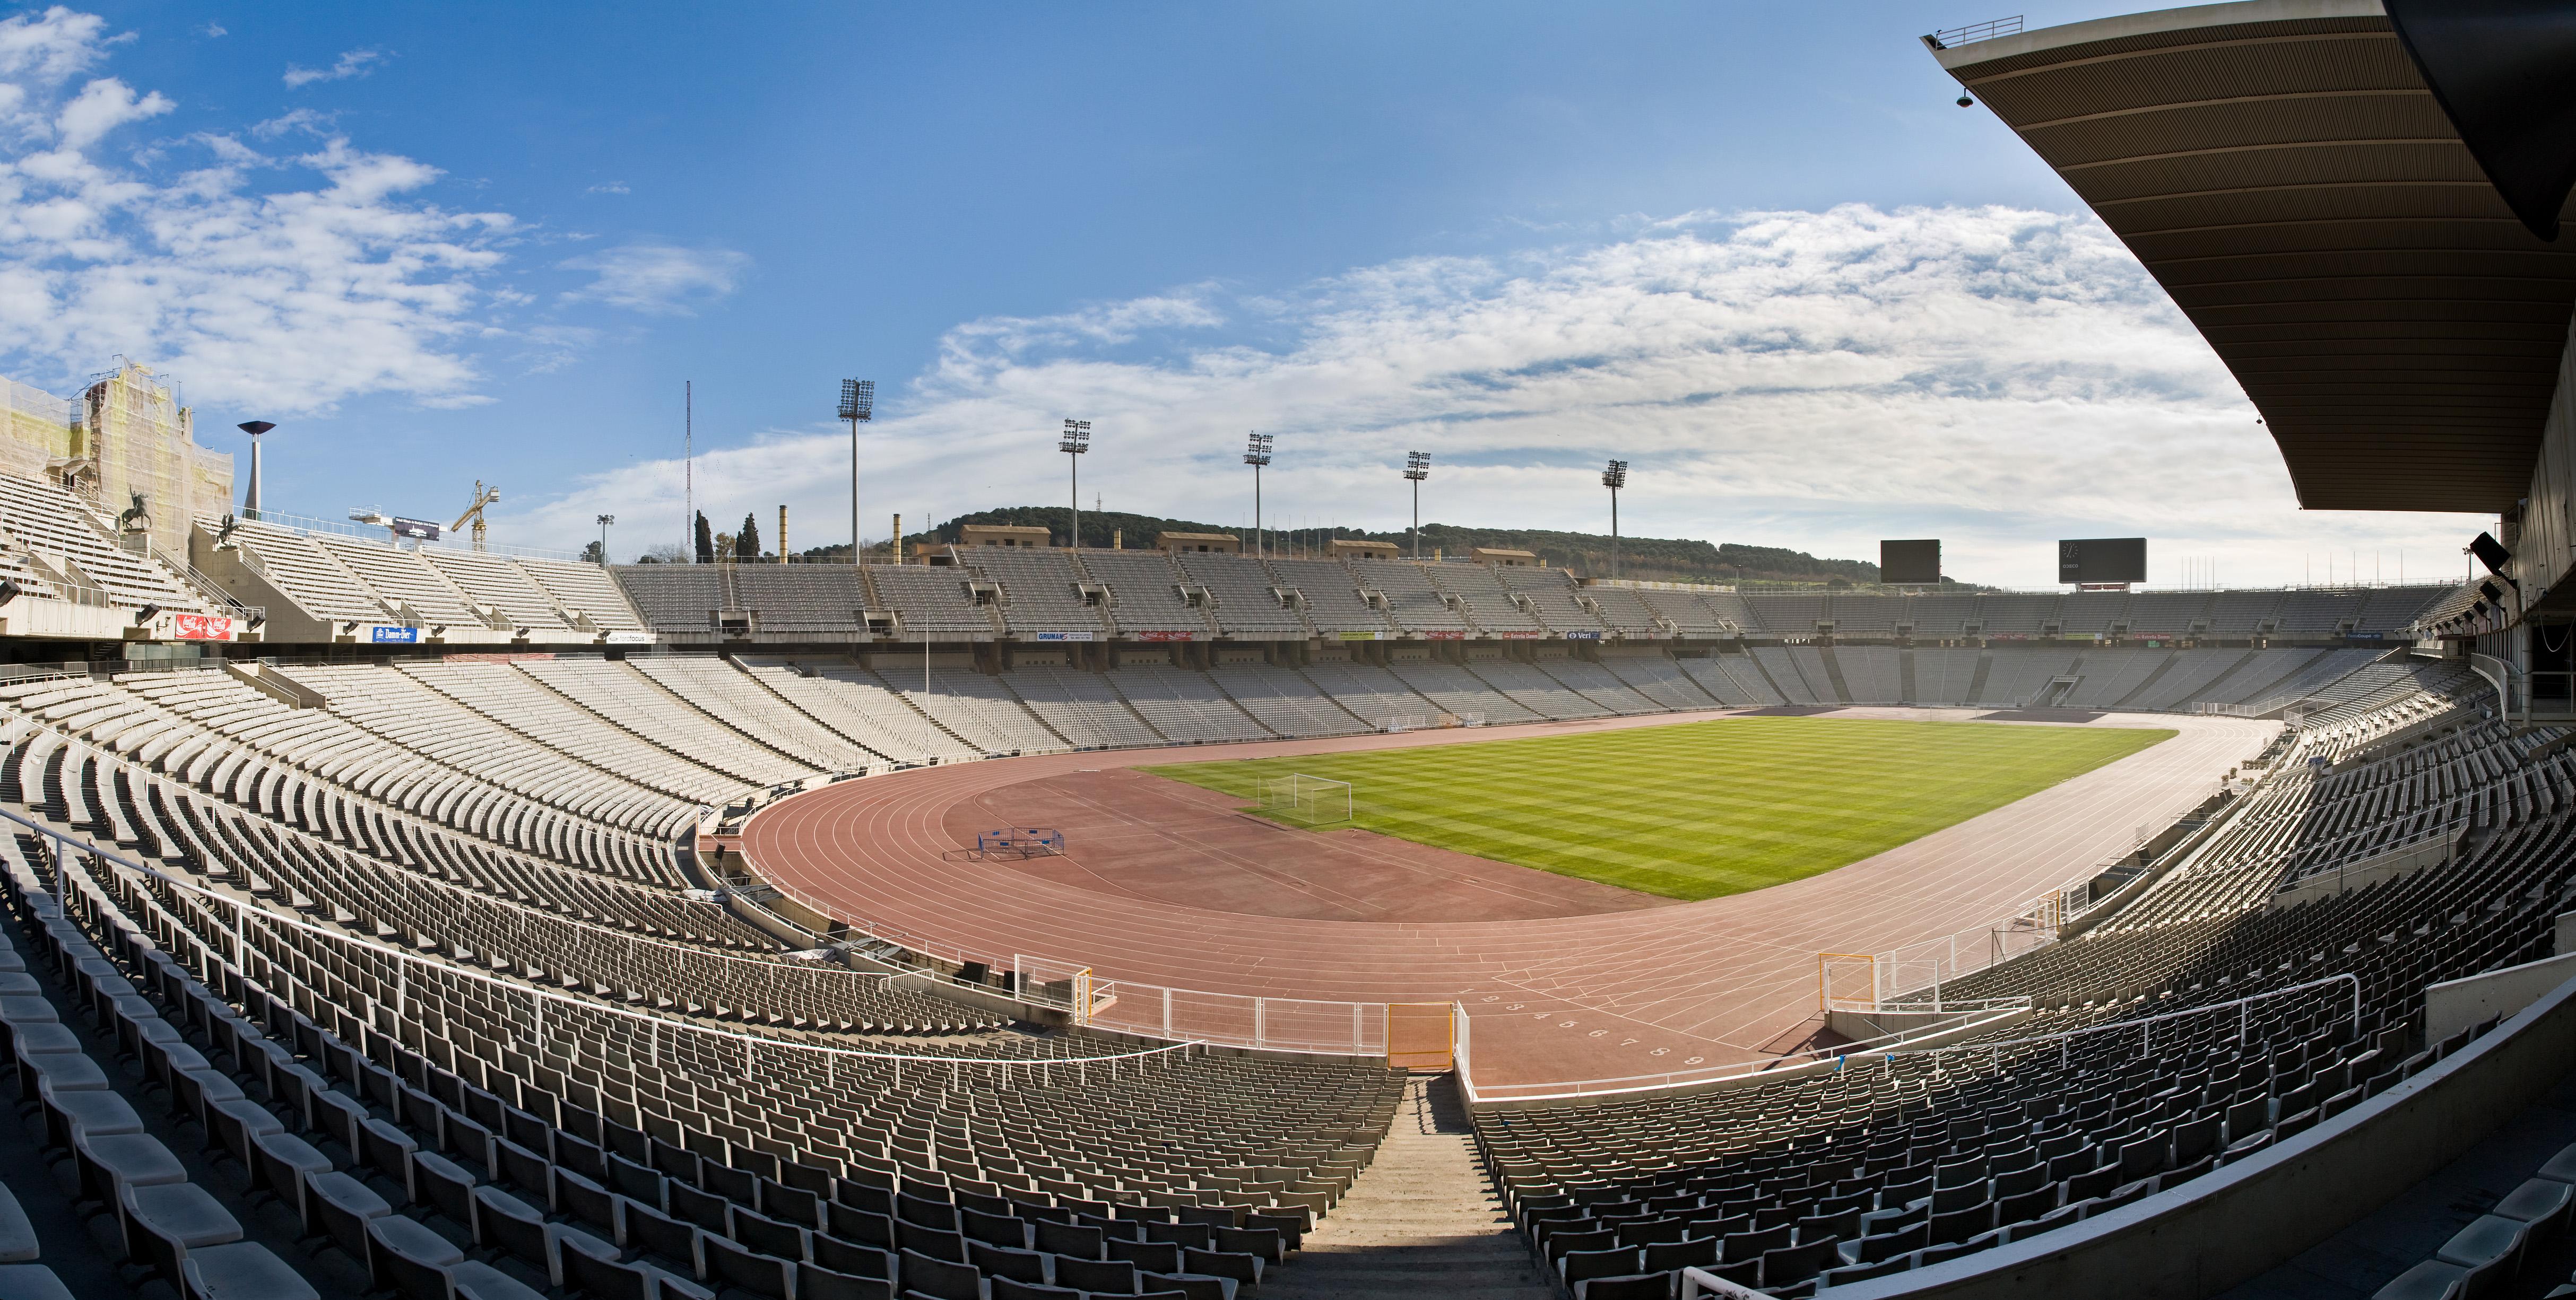 estadi_olimpic_lluis_companys_-_barcelona_spain_-_jan_2007